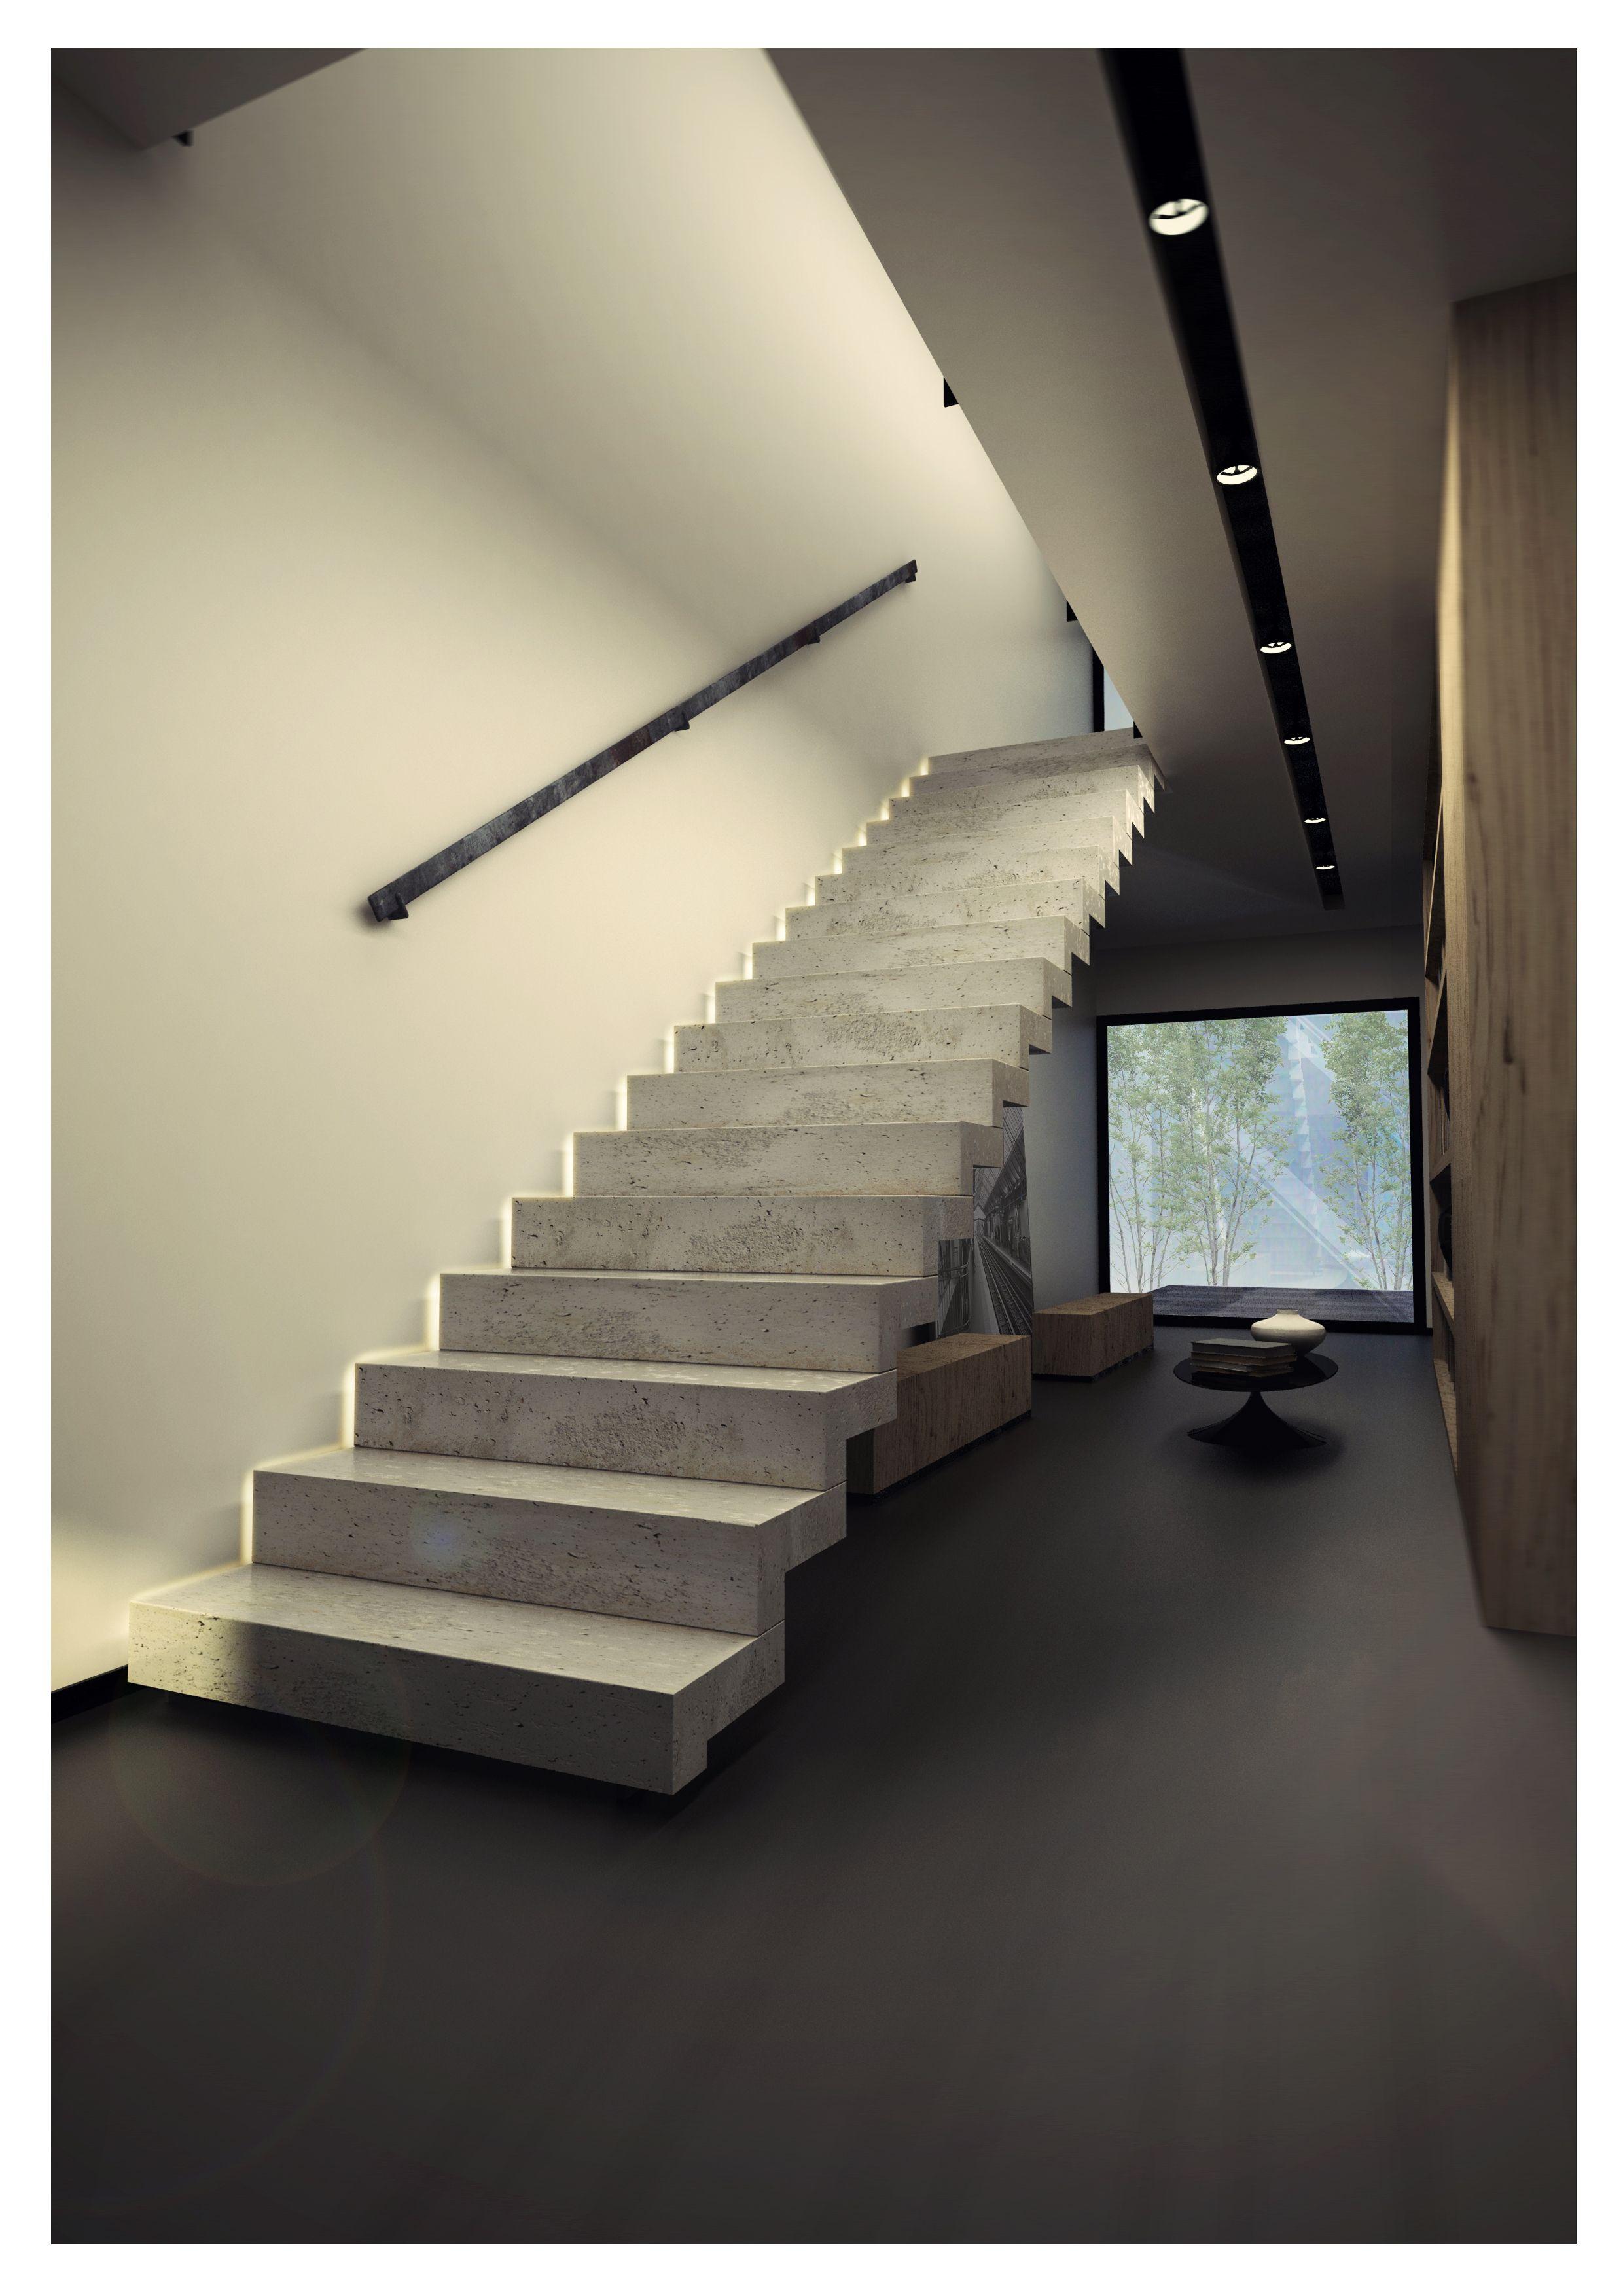 Escalier beton kozac haus pinterest escalier beton beton et escaliers - Escalier beton moderne ...